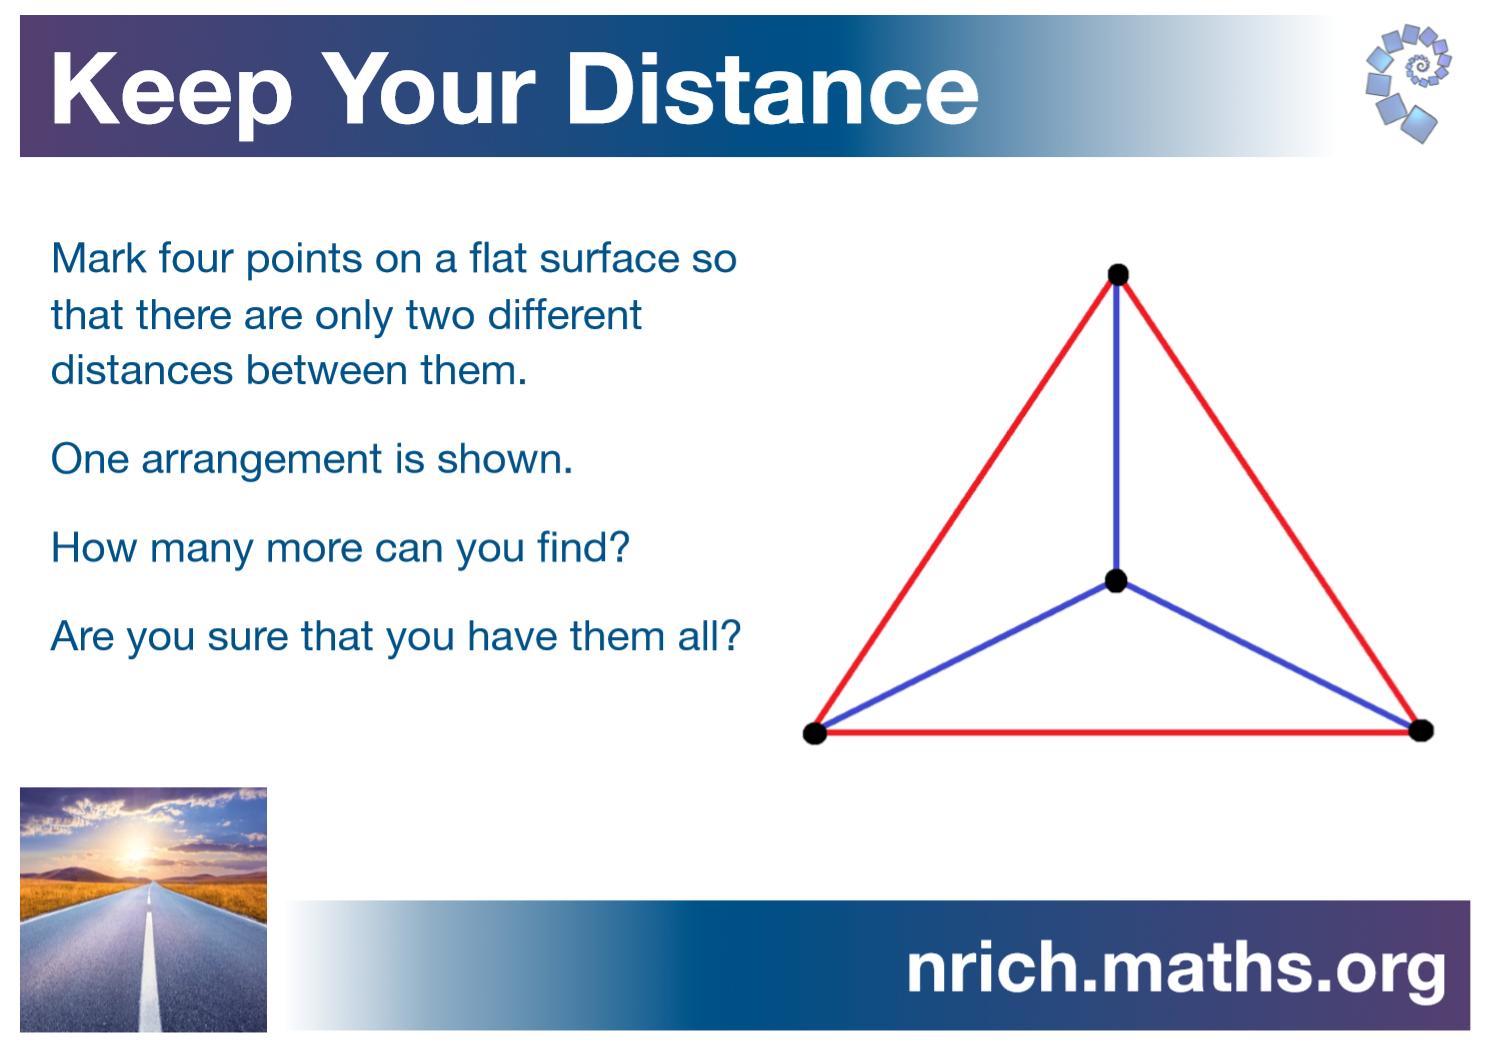 Keep Your Distance Poster : nrich.maths.org